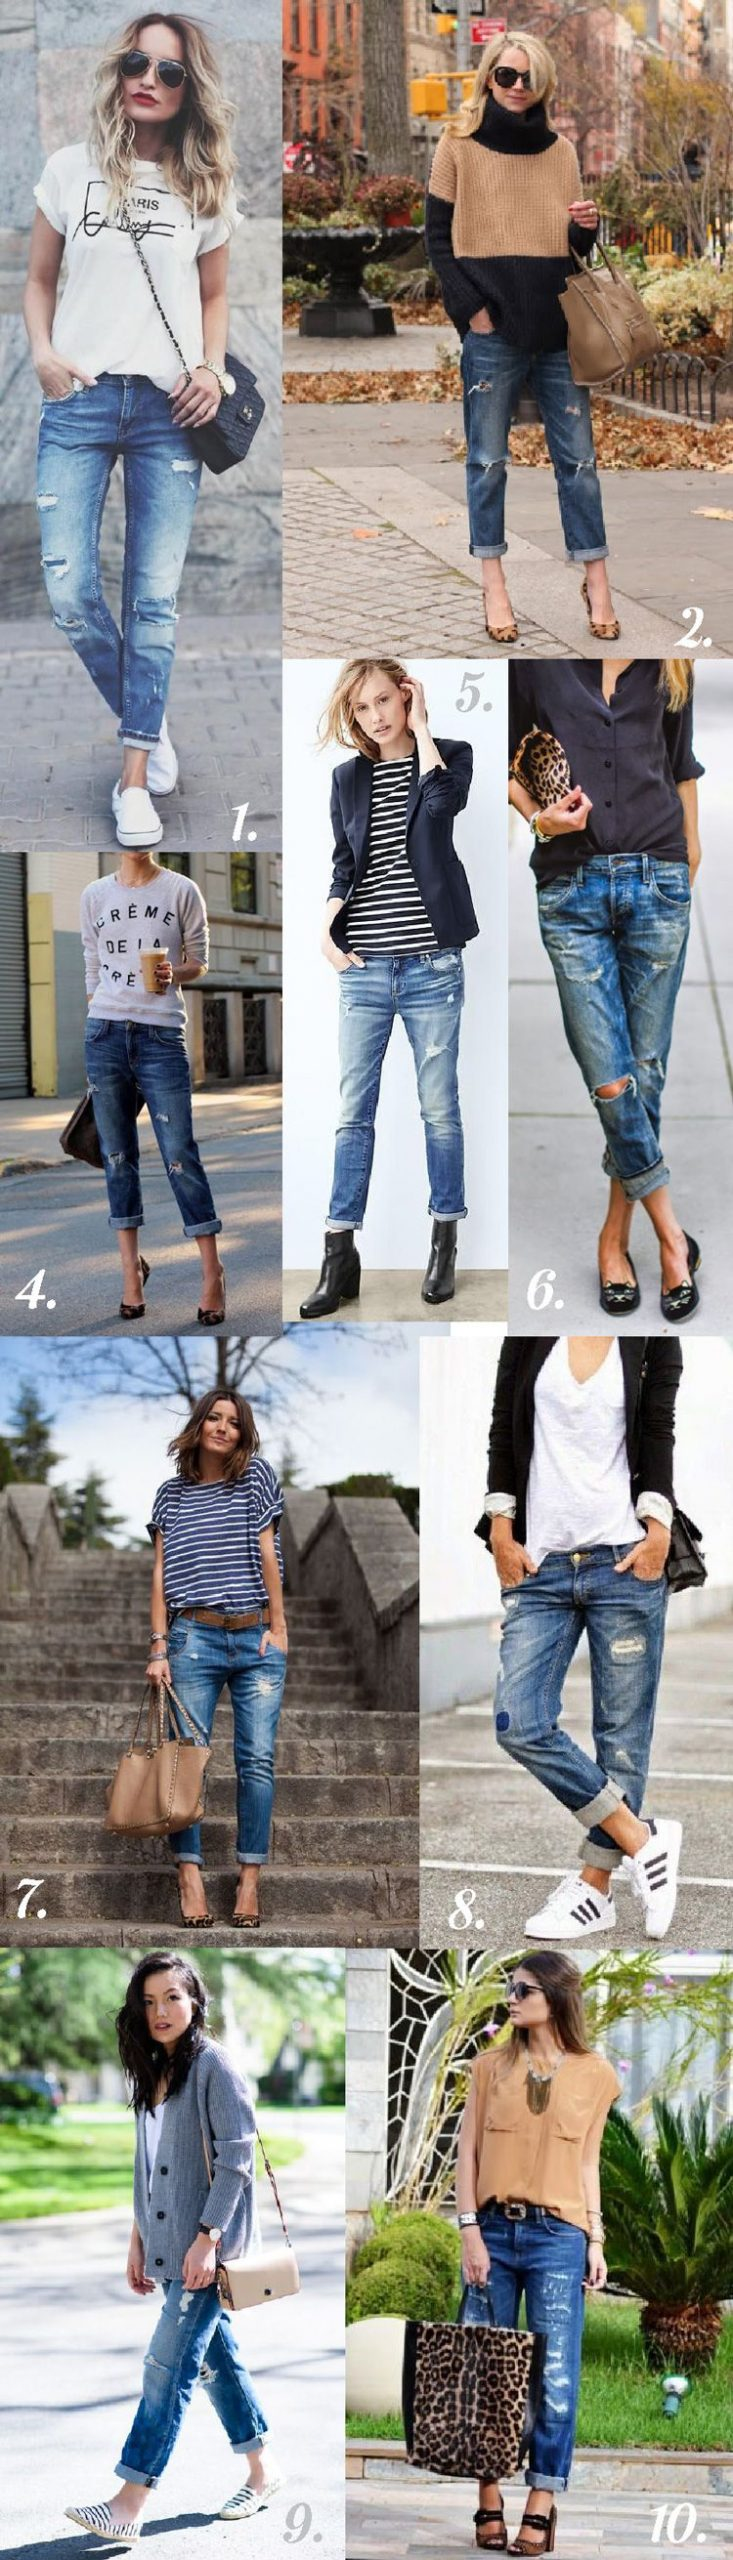 Morgan Boyfriend Jeans // Styling Inspiration